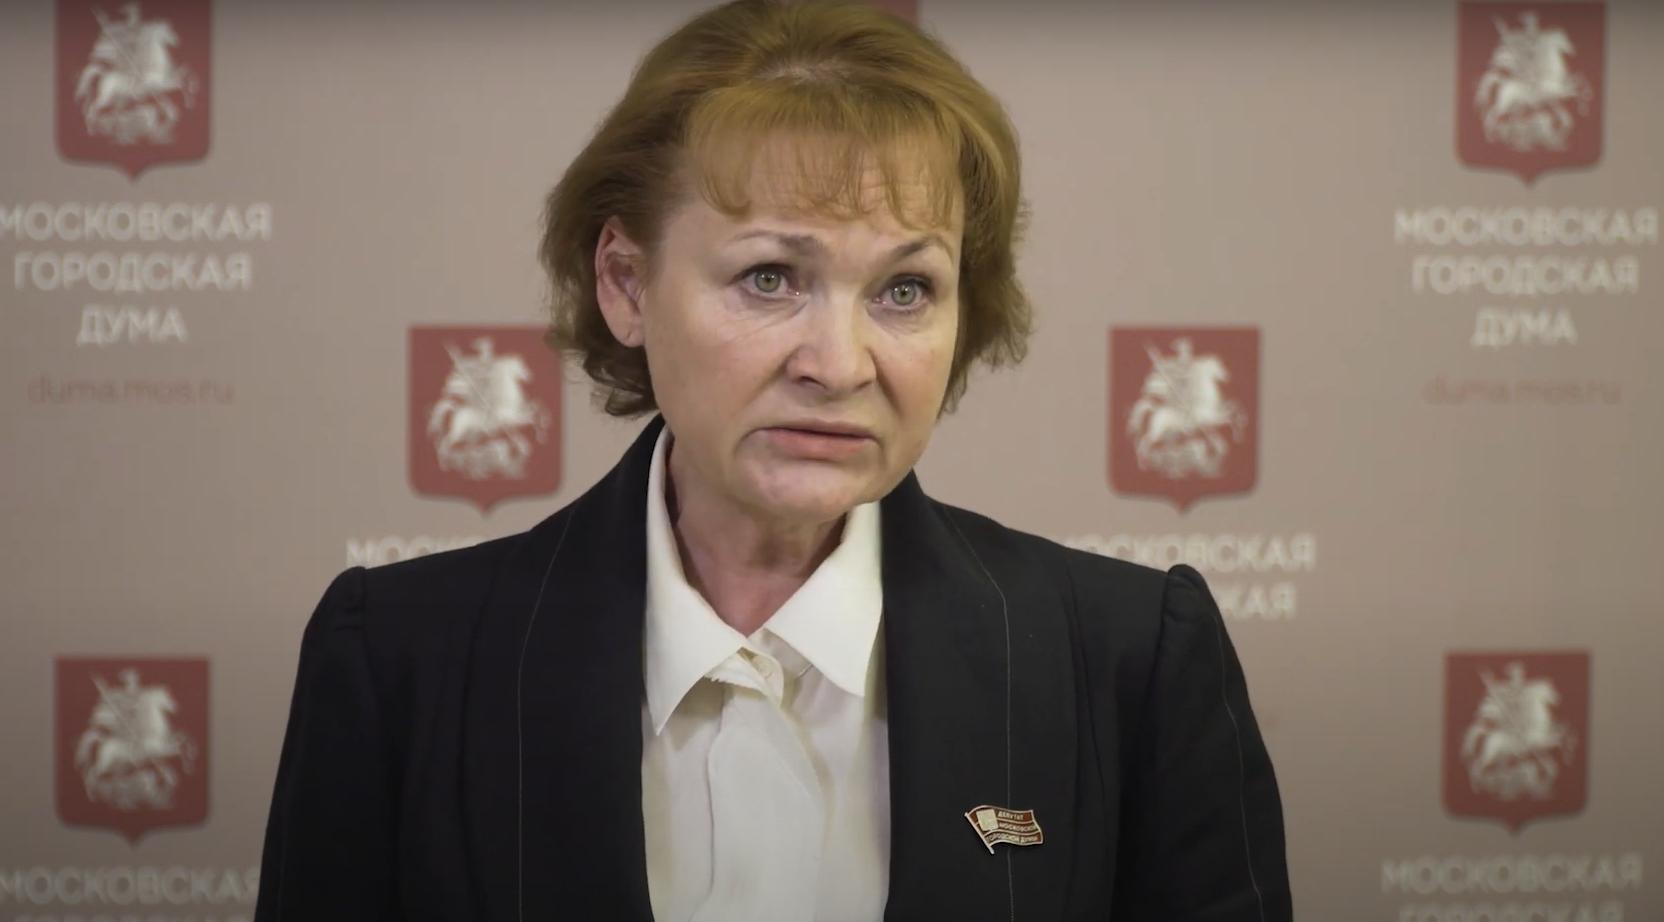 Депутат МГД Стебенкова: Соцработники до осени продолжат бесплатно доставлять лекарства